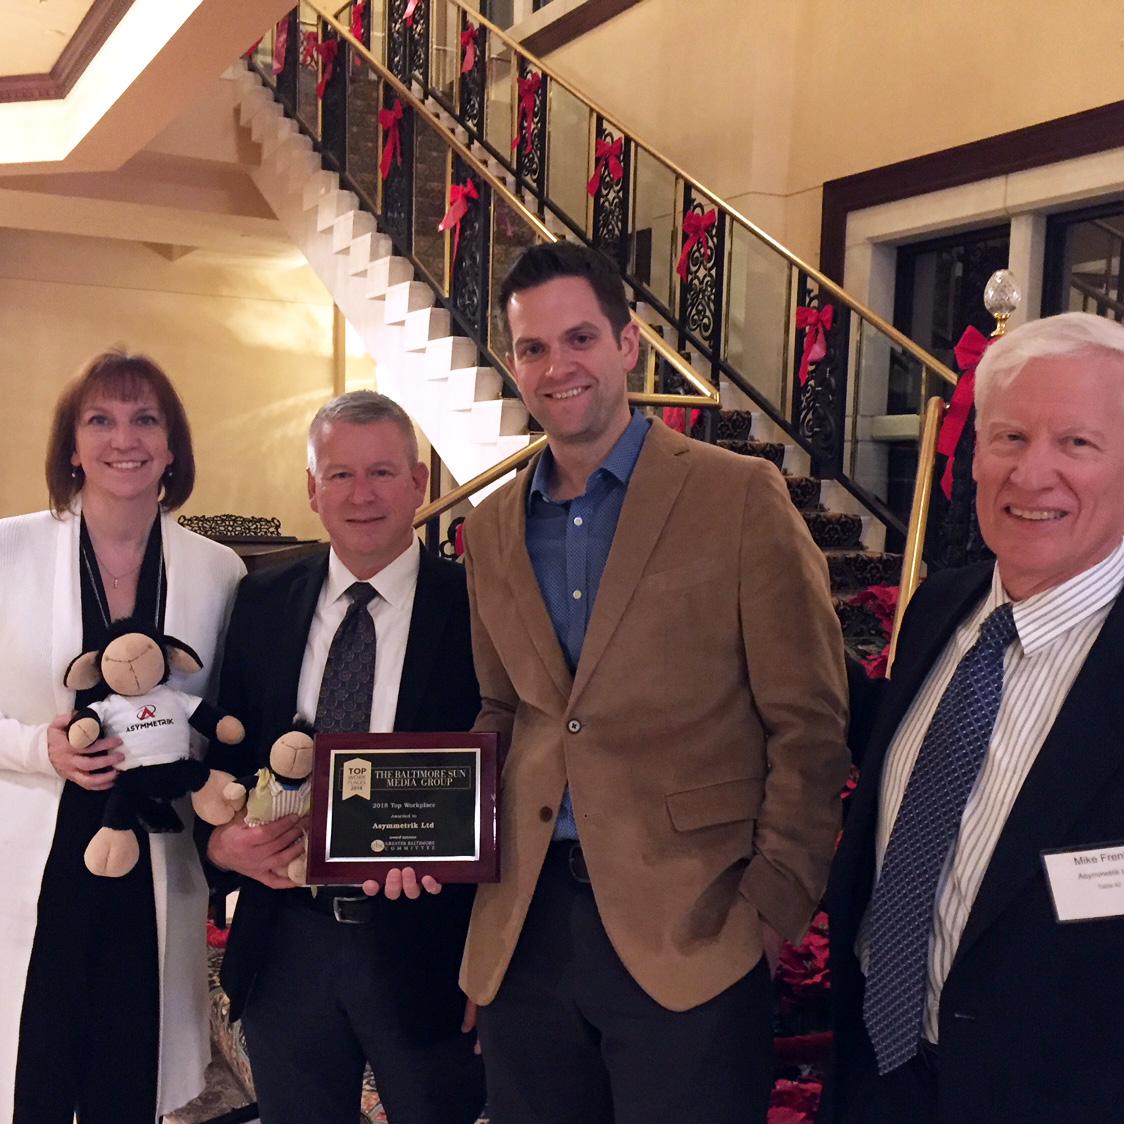 The Baltimore Sun Top Workplaces 2018 award